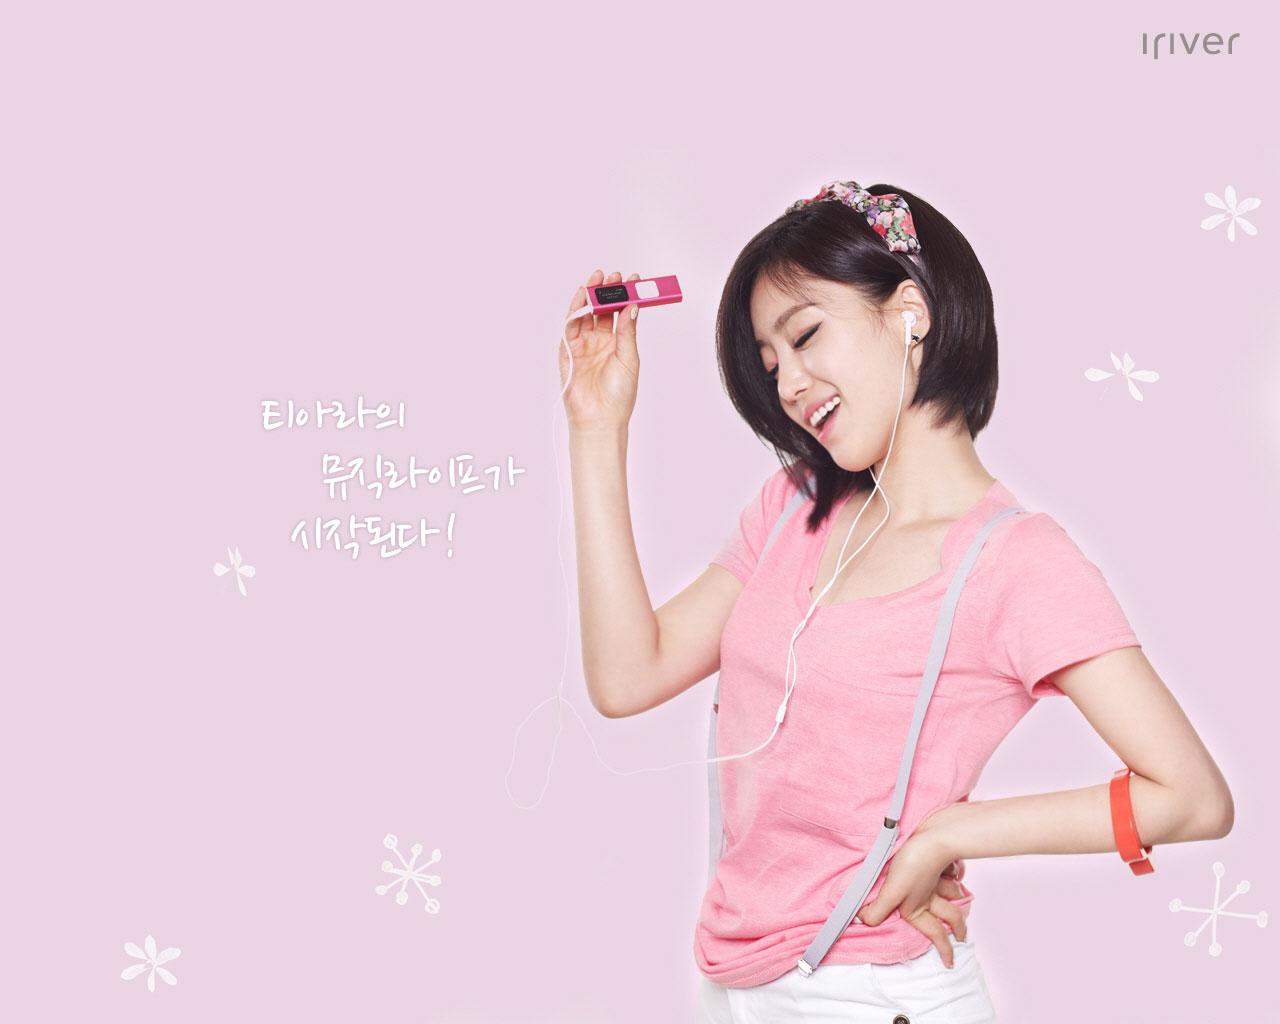 T-ara Eunjung Iriver wallpaper